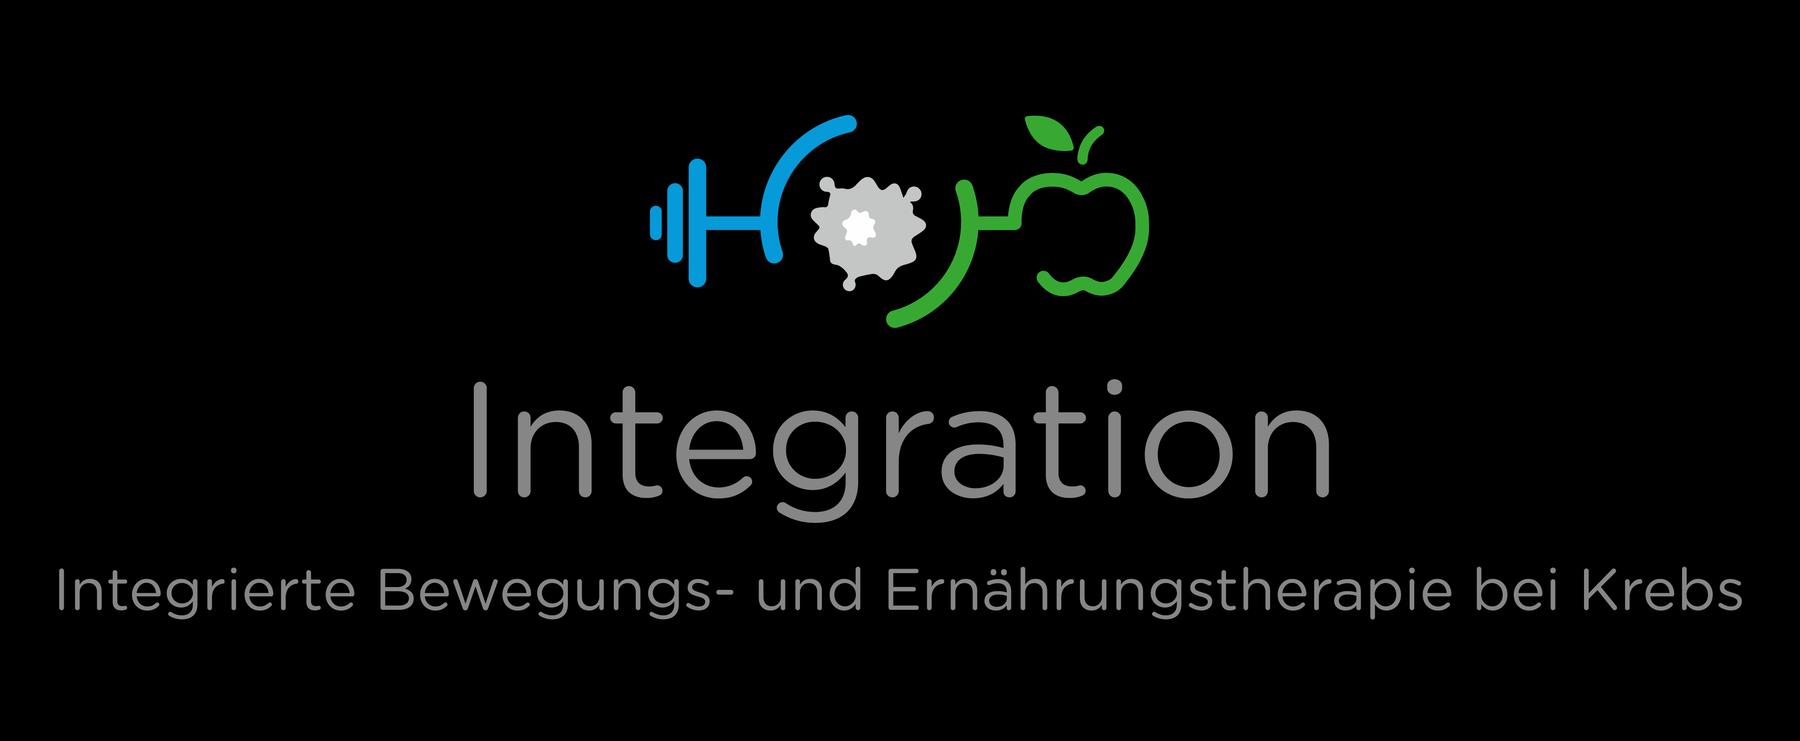 INTEGRATION-Studie